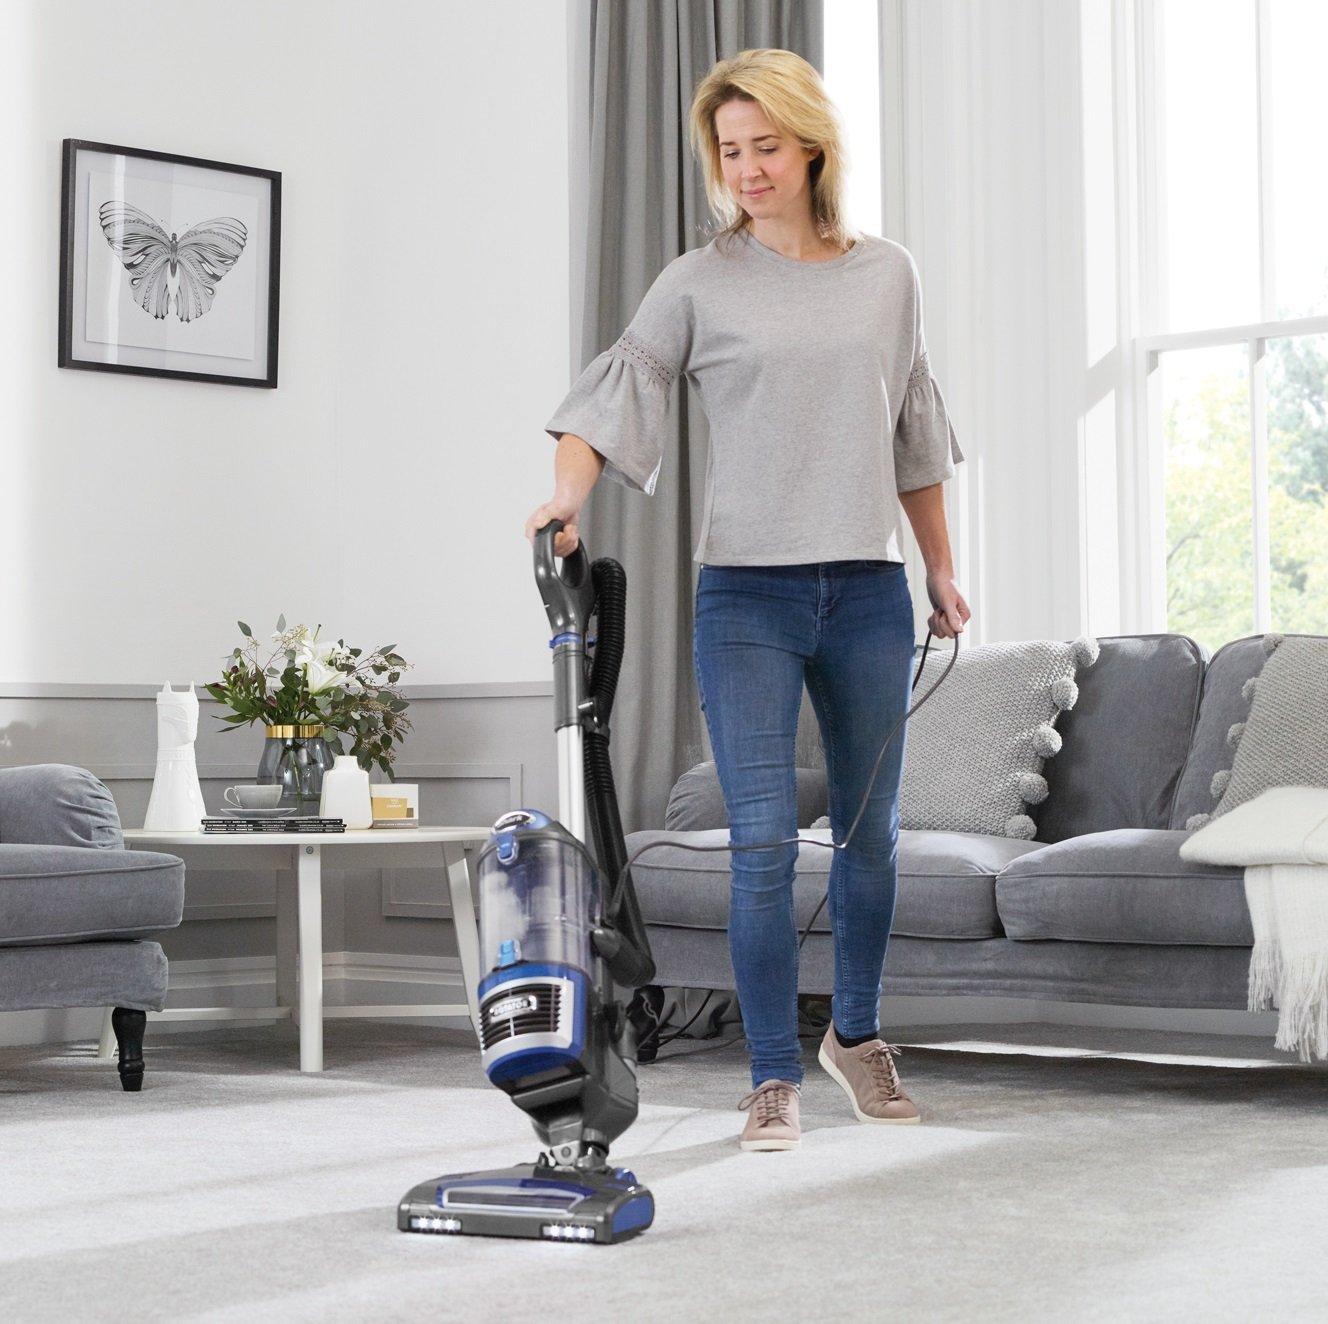 Shark NV601UK Lift-Away Upright Vacuum Cleaner